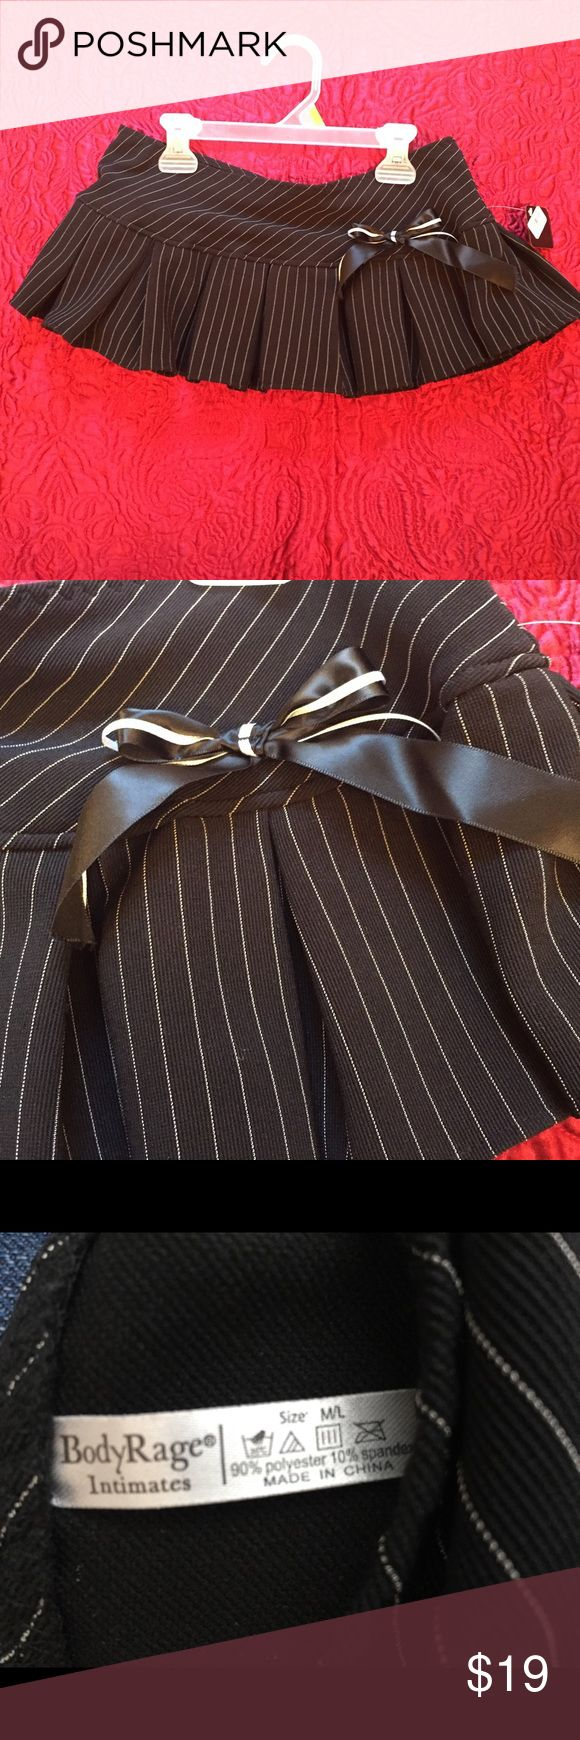 Micro Mini Skirt Pinstriped School Girl Micro Mini Skirt W/ Pleats And Hip Bow Size M/L Body Rage Intimates Skirts Mini